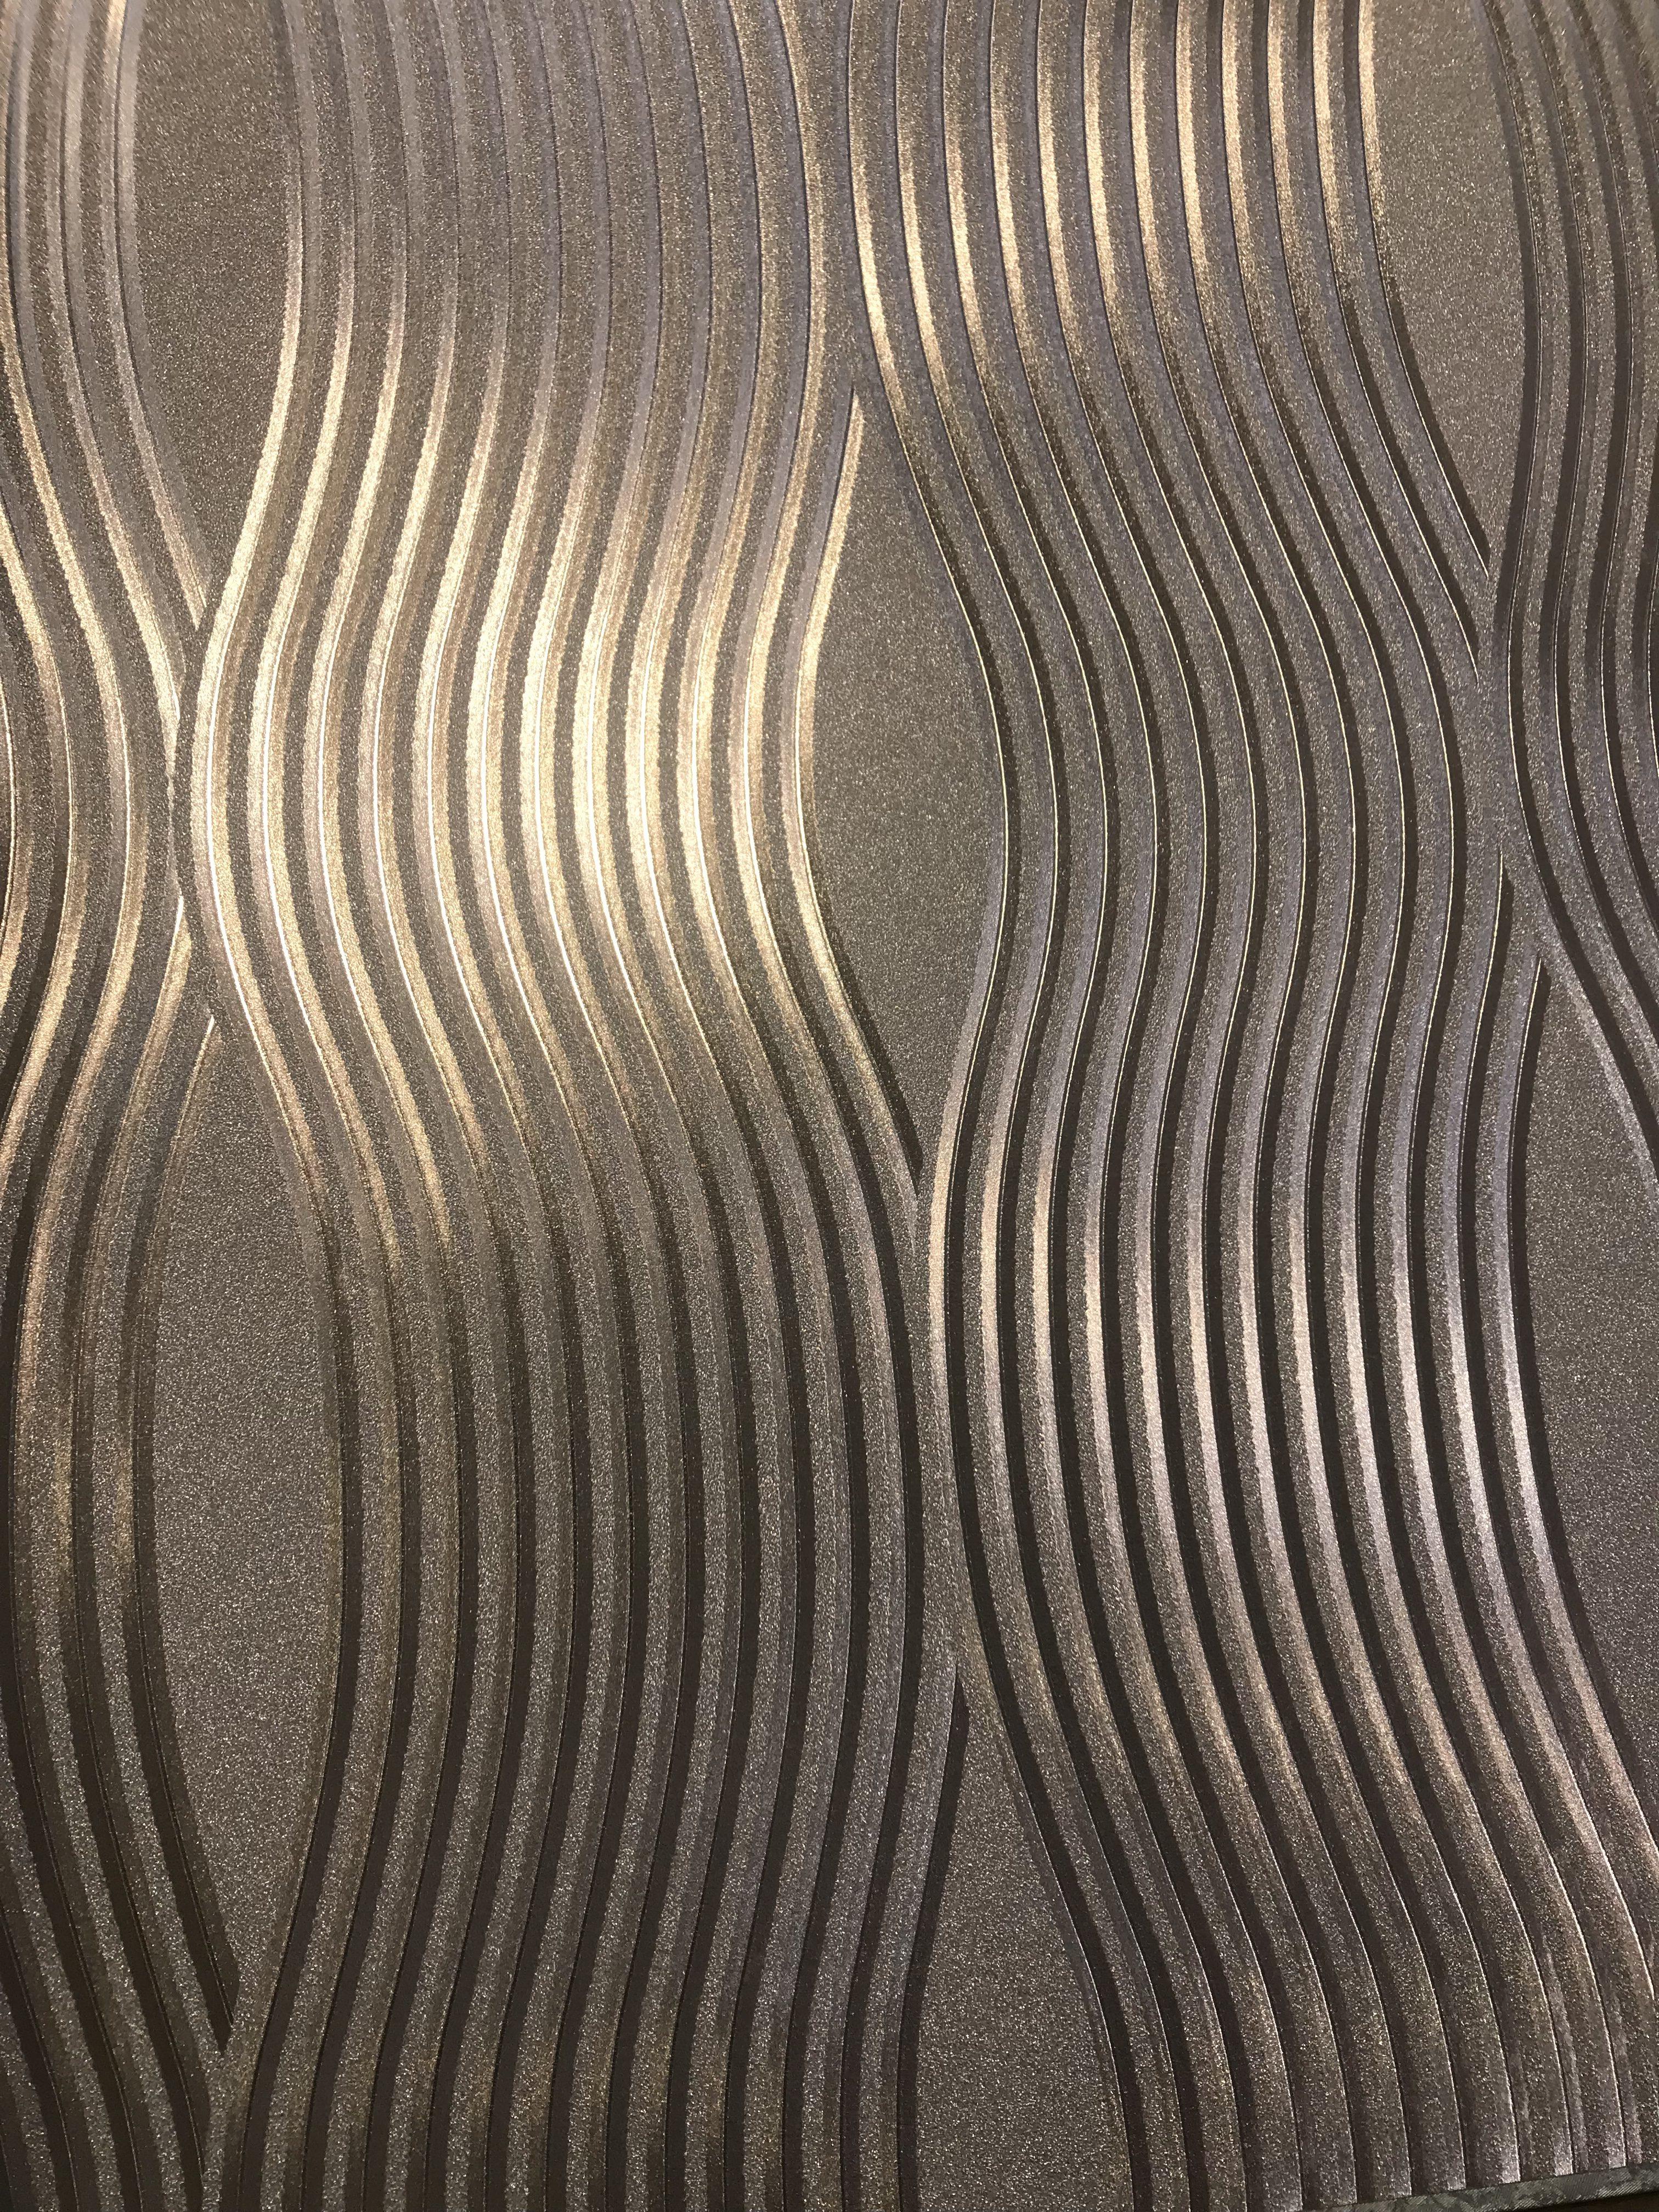 Rose Gold Foil Metallic Wave Wallpaper Sales